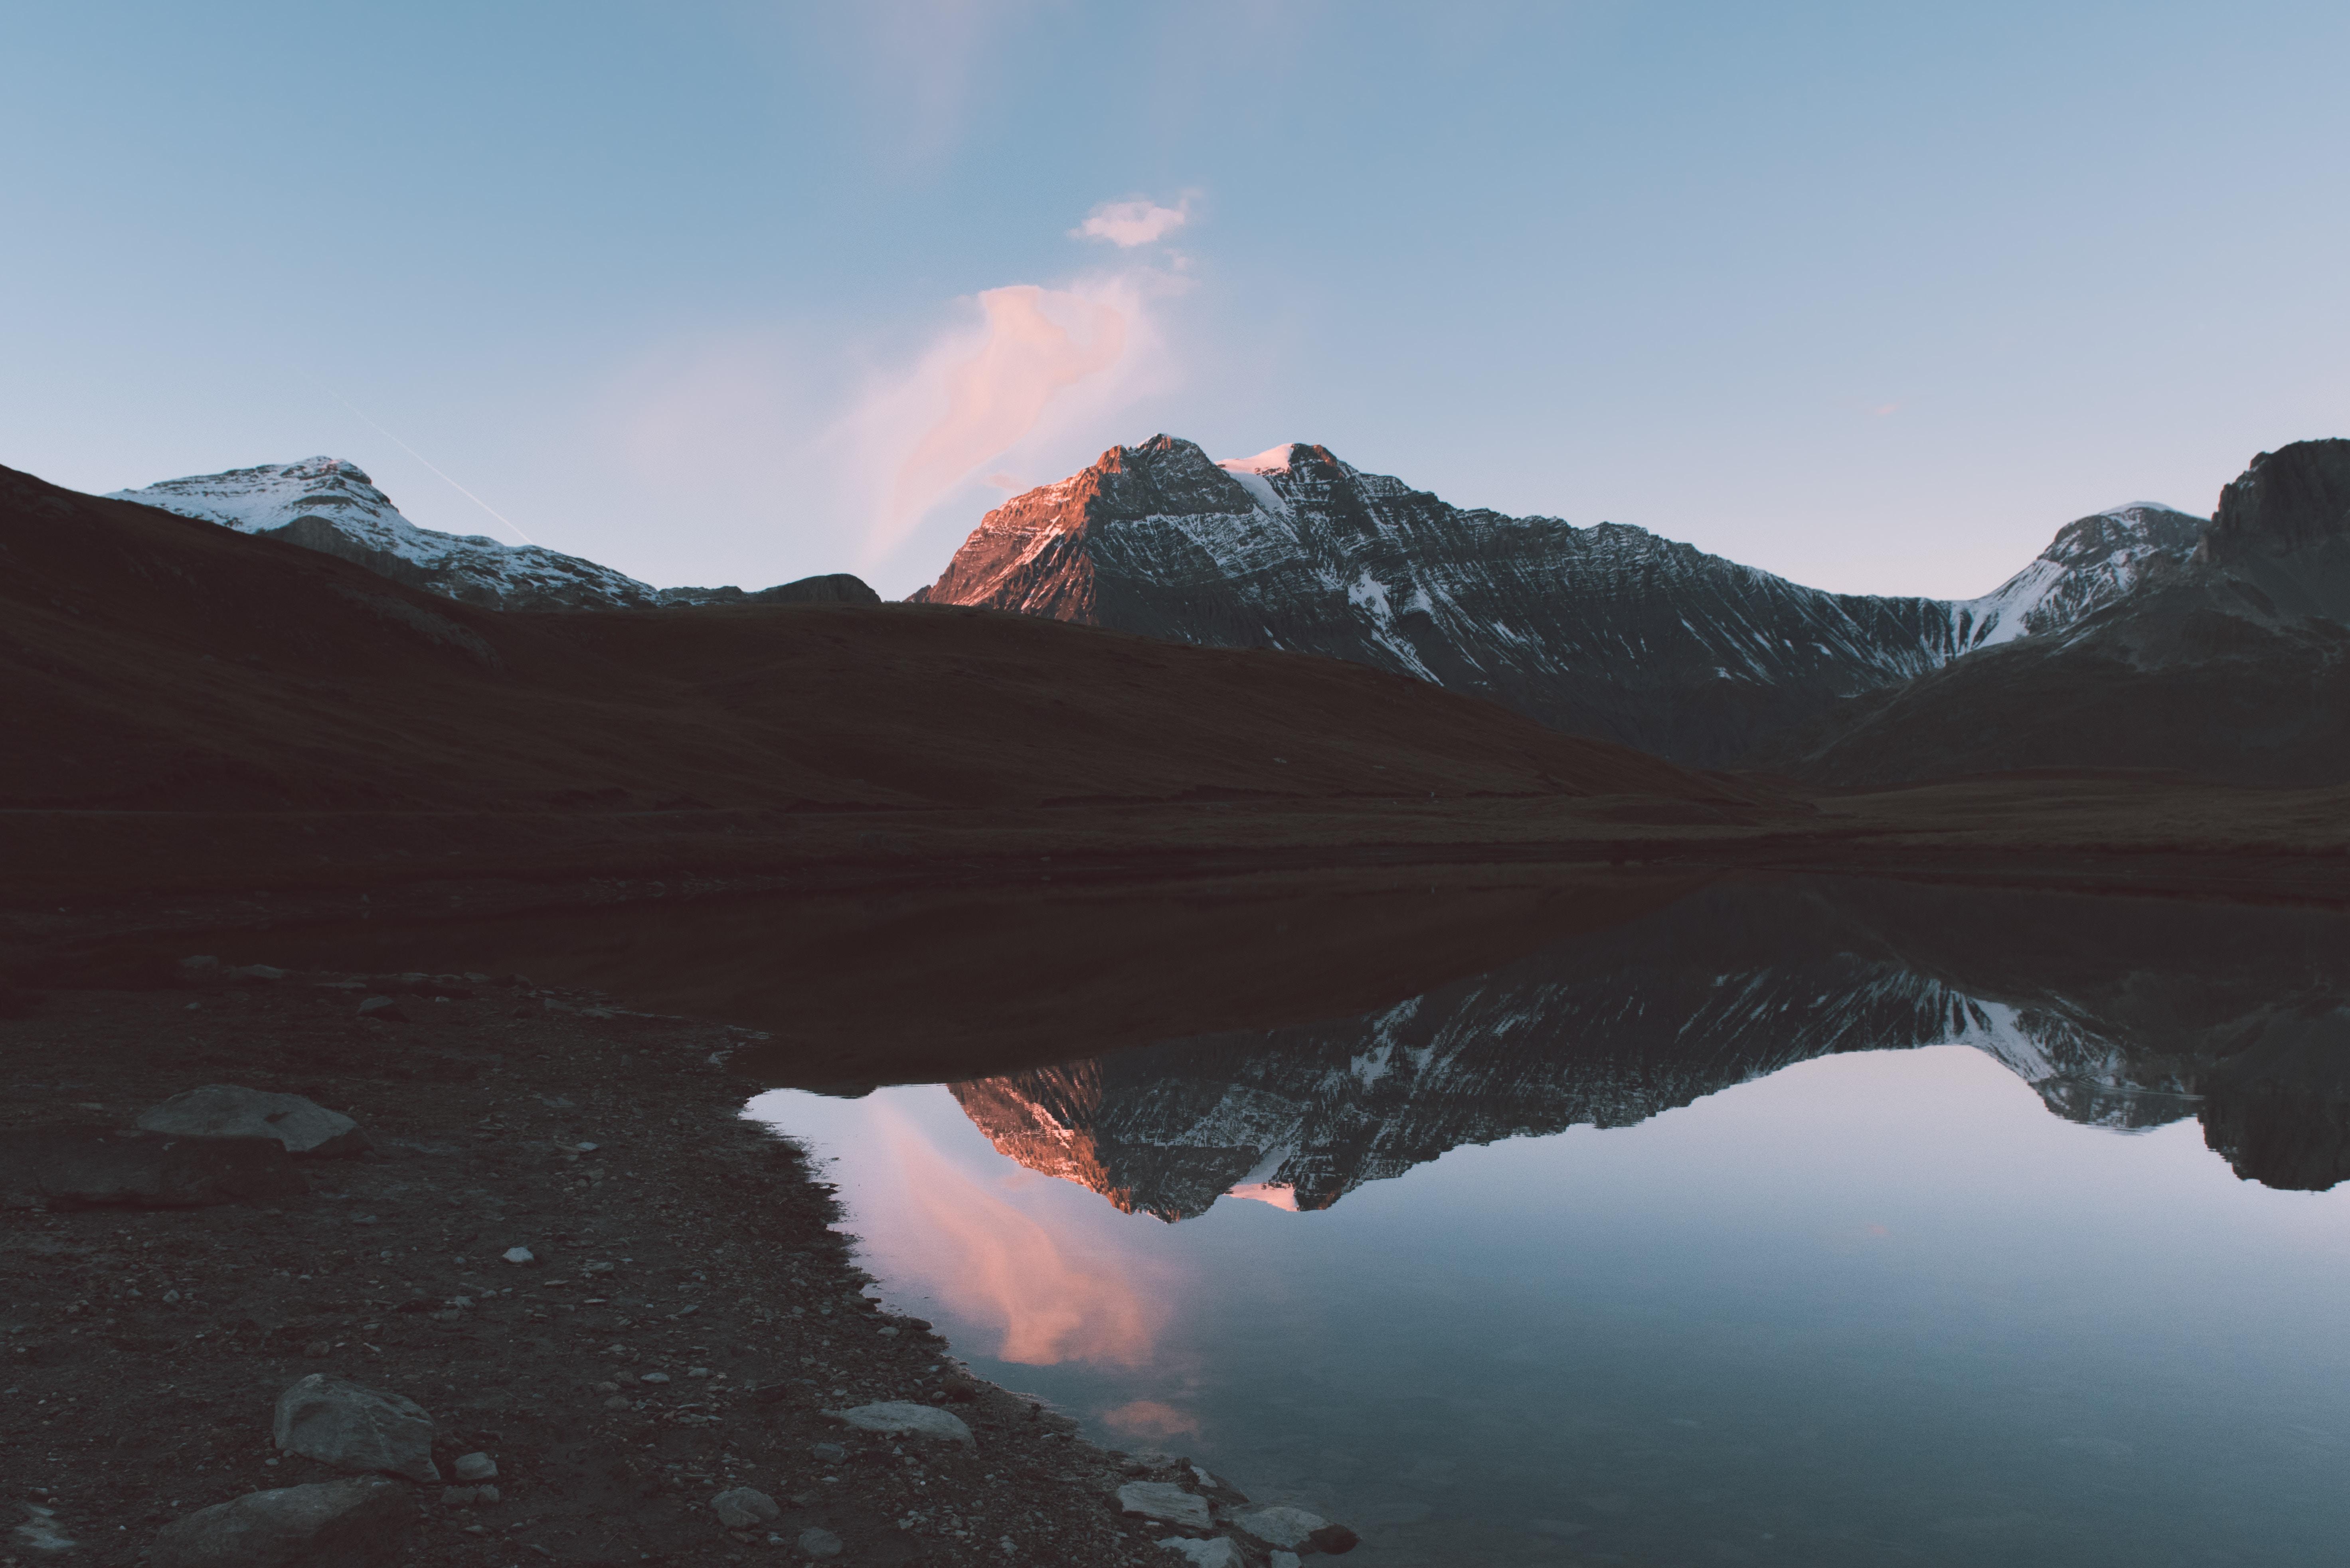 landscape photo of lake near gray mountains during daytime